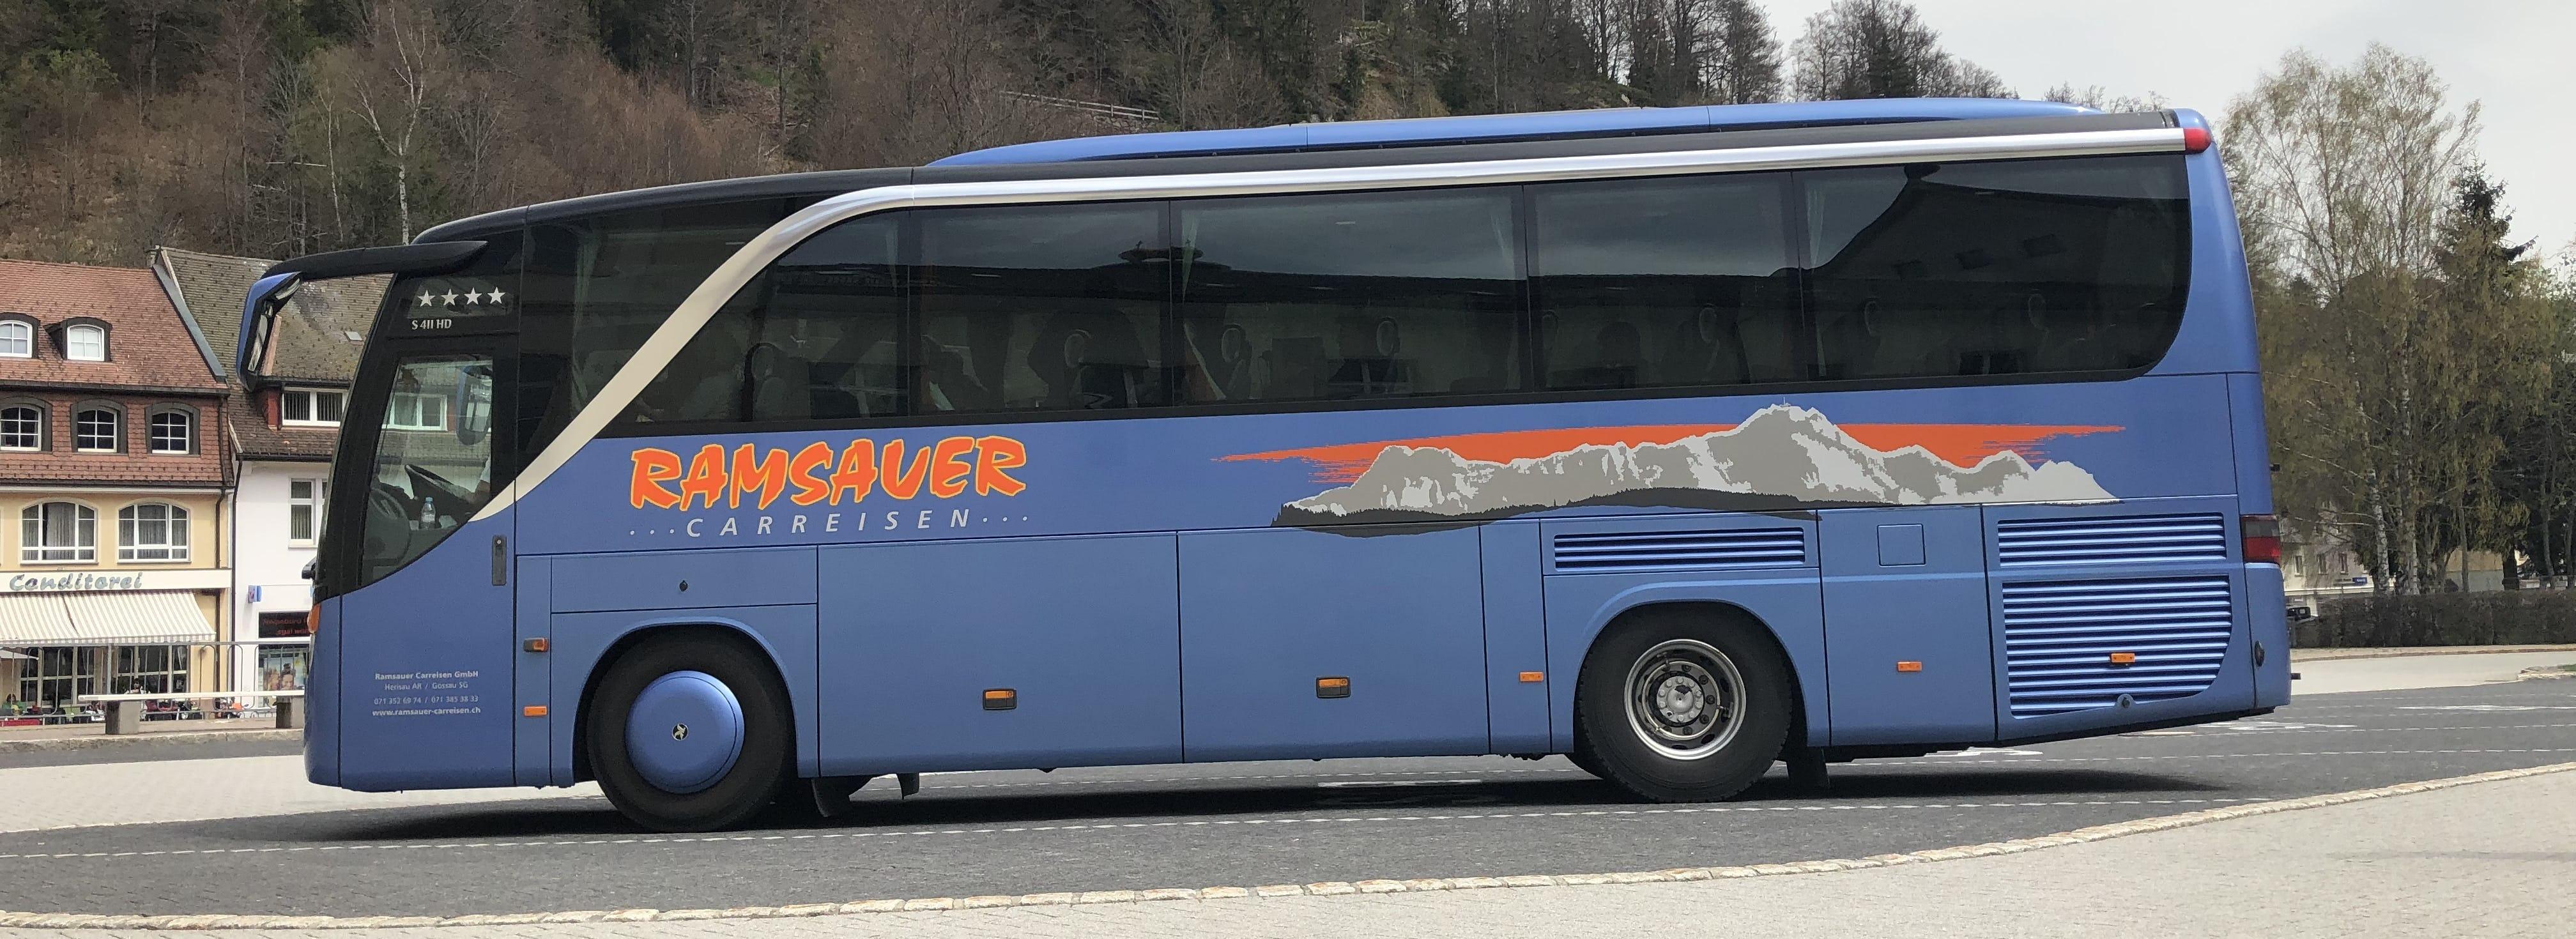 38 Plätzer Car S 411 HD Osterreise